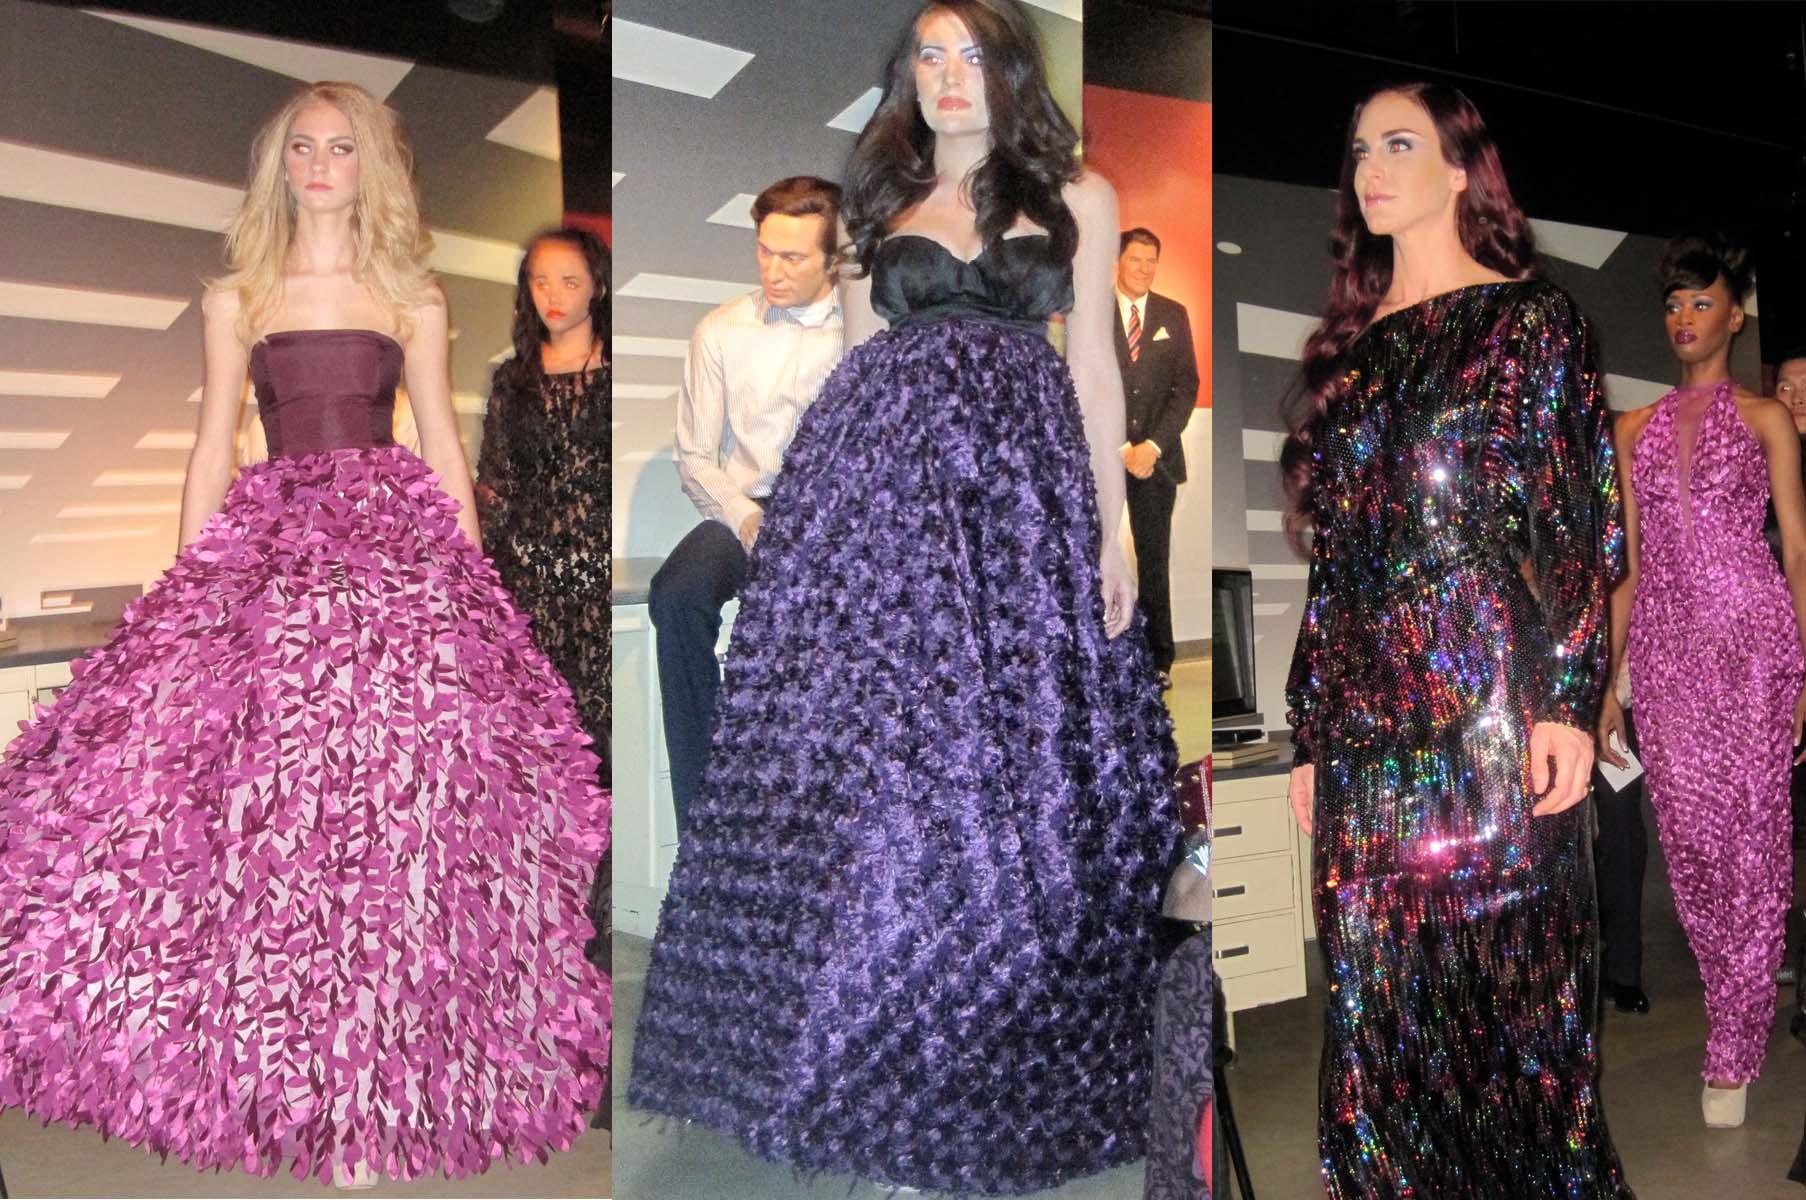 Corjor International at D.C. Fashion Week (Photo: Erica Moody/DC on Heels)